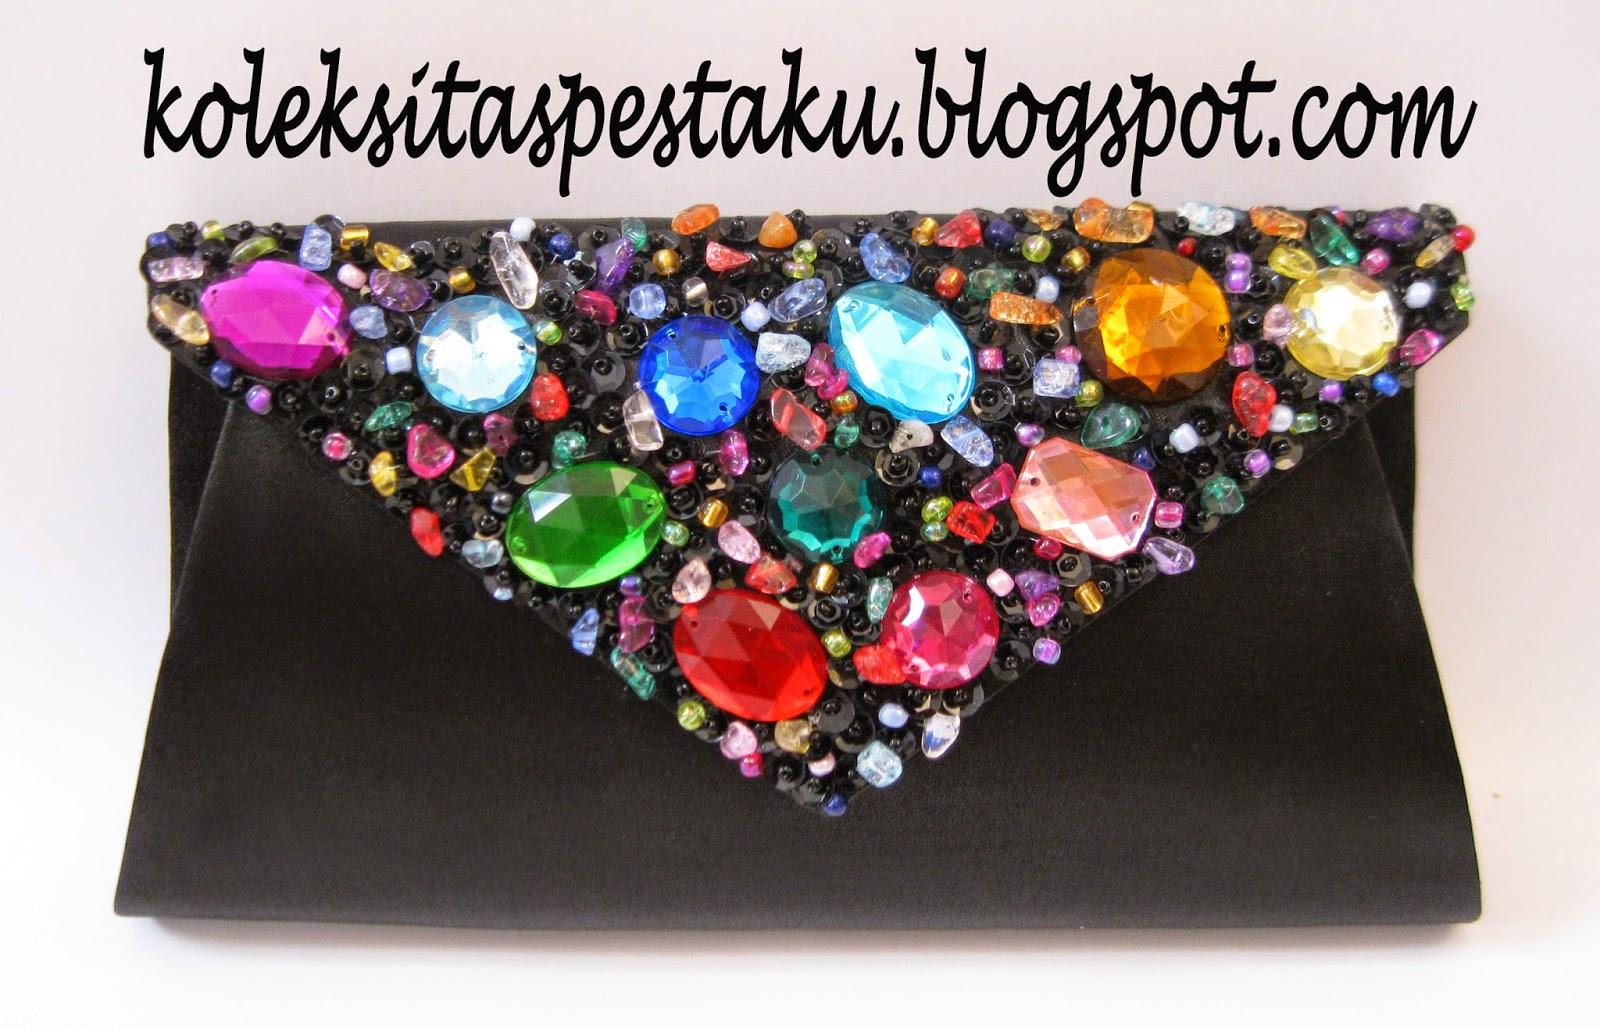 Model Terbaru Clutch Bag Tas Pesta Koleksi Tas Pesta Ku Cantik